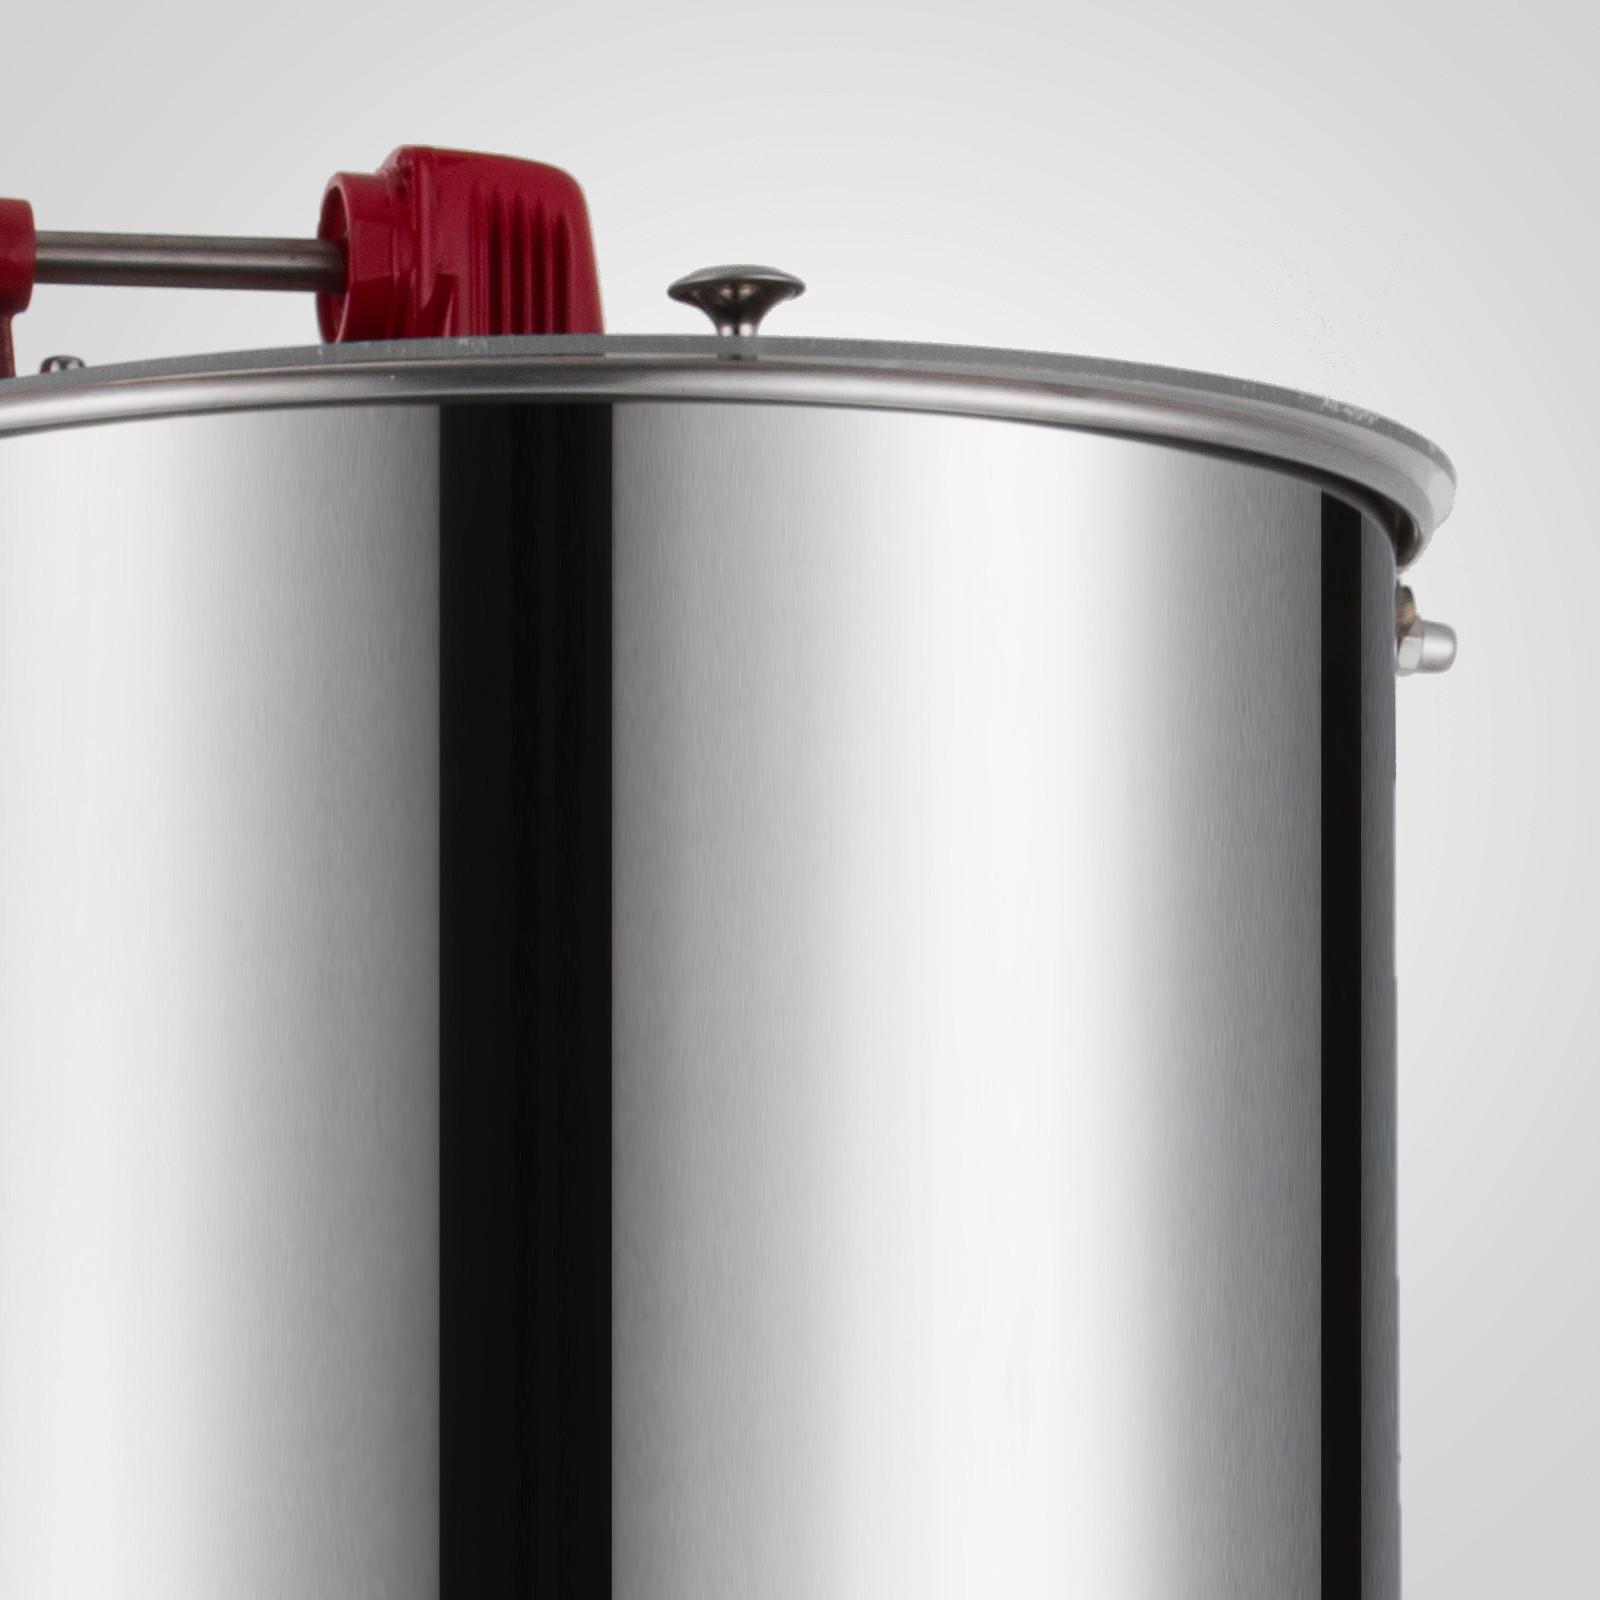 Extracteur-de-Miel-Electrique-manuelle-2-3-4-Cadres-En-Acier-Inox-Centrifugeuse miniature 57